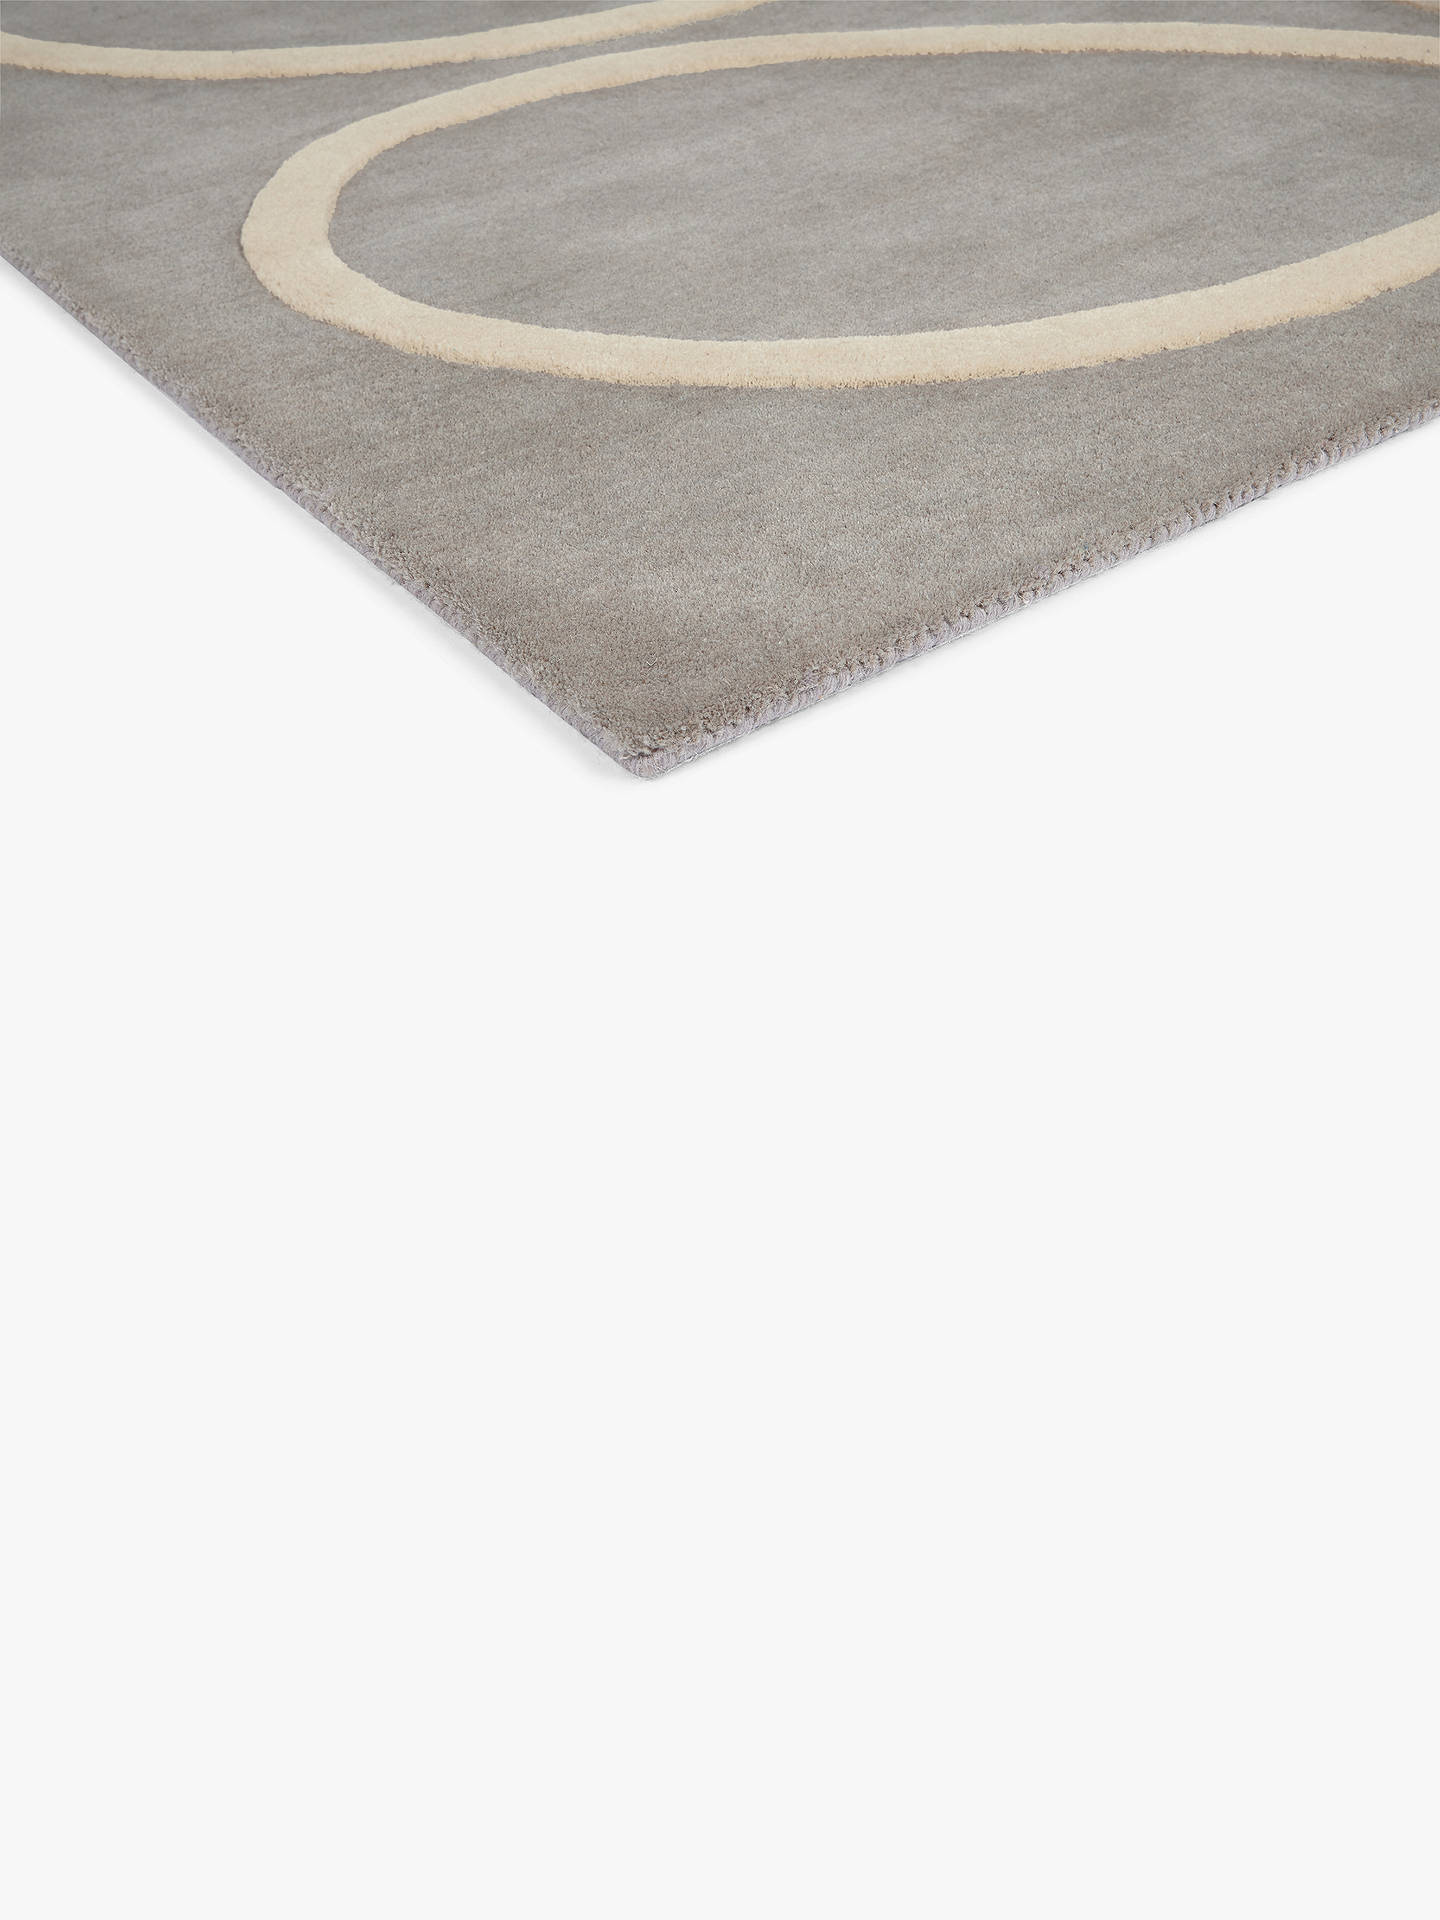 Orla Kiely Giant Linear Stem Rug, L230